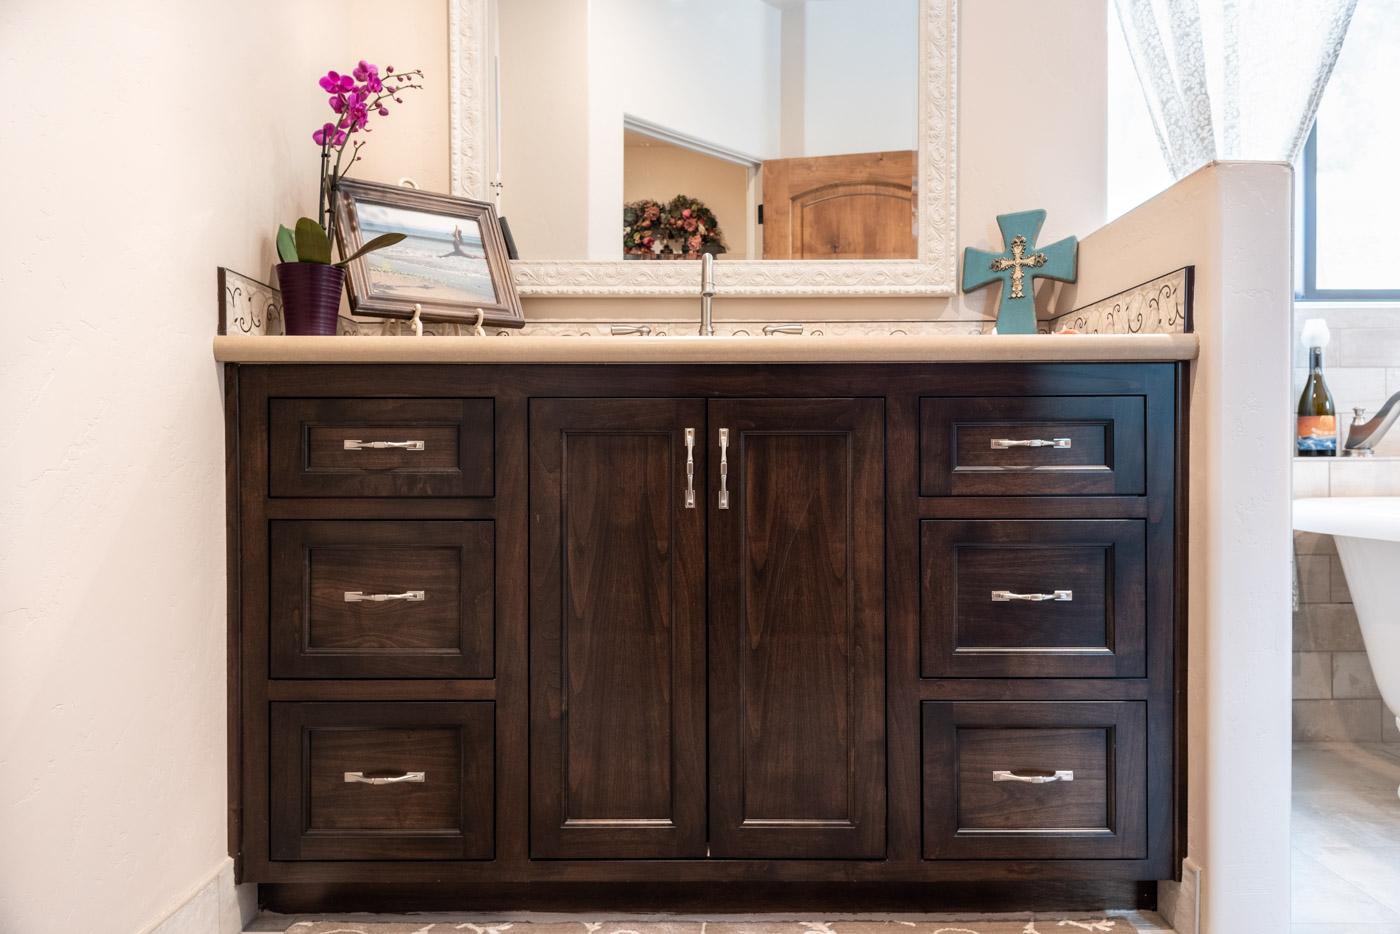 Tuscan Artisan custom stained Alder wood bathroom vanity cabinet